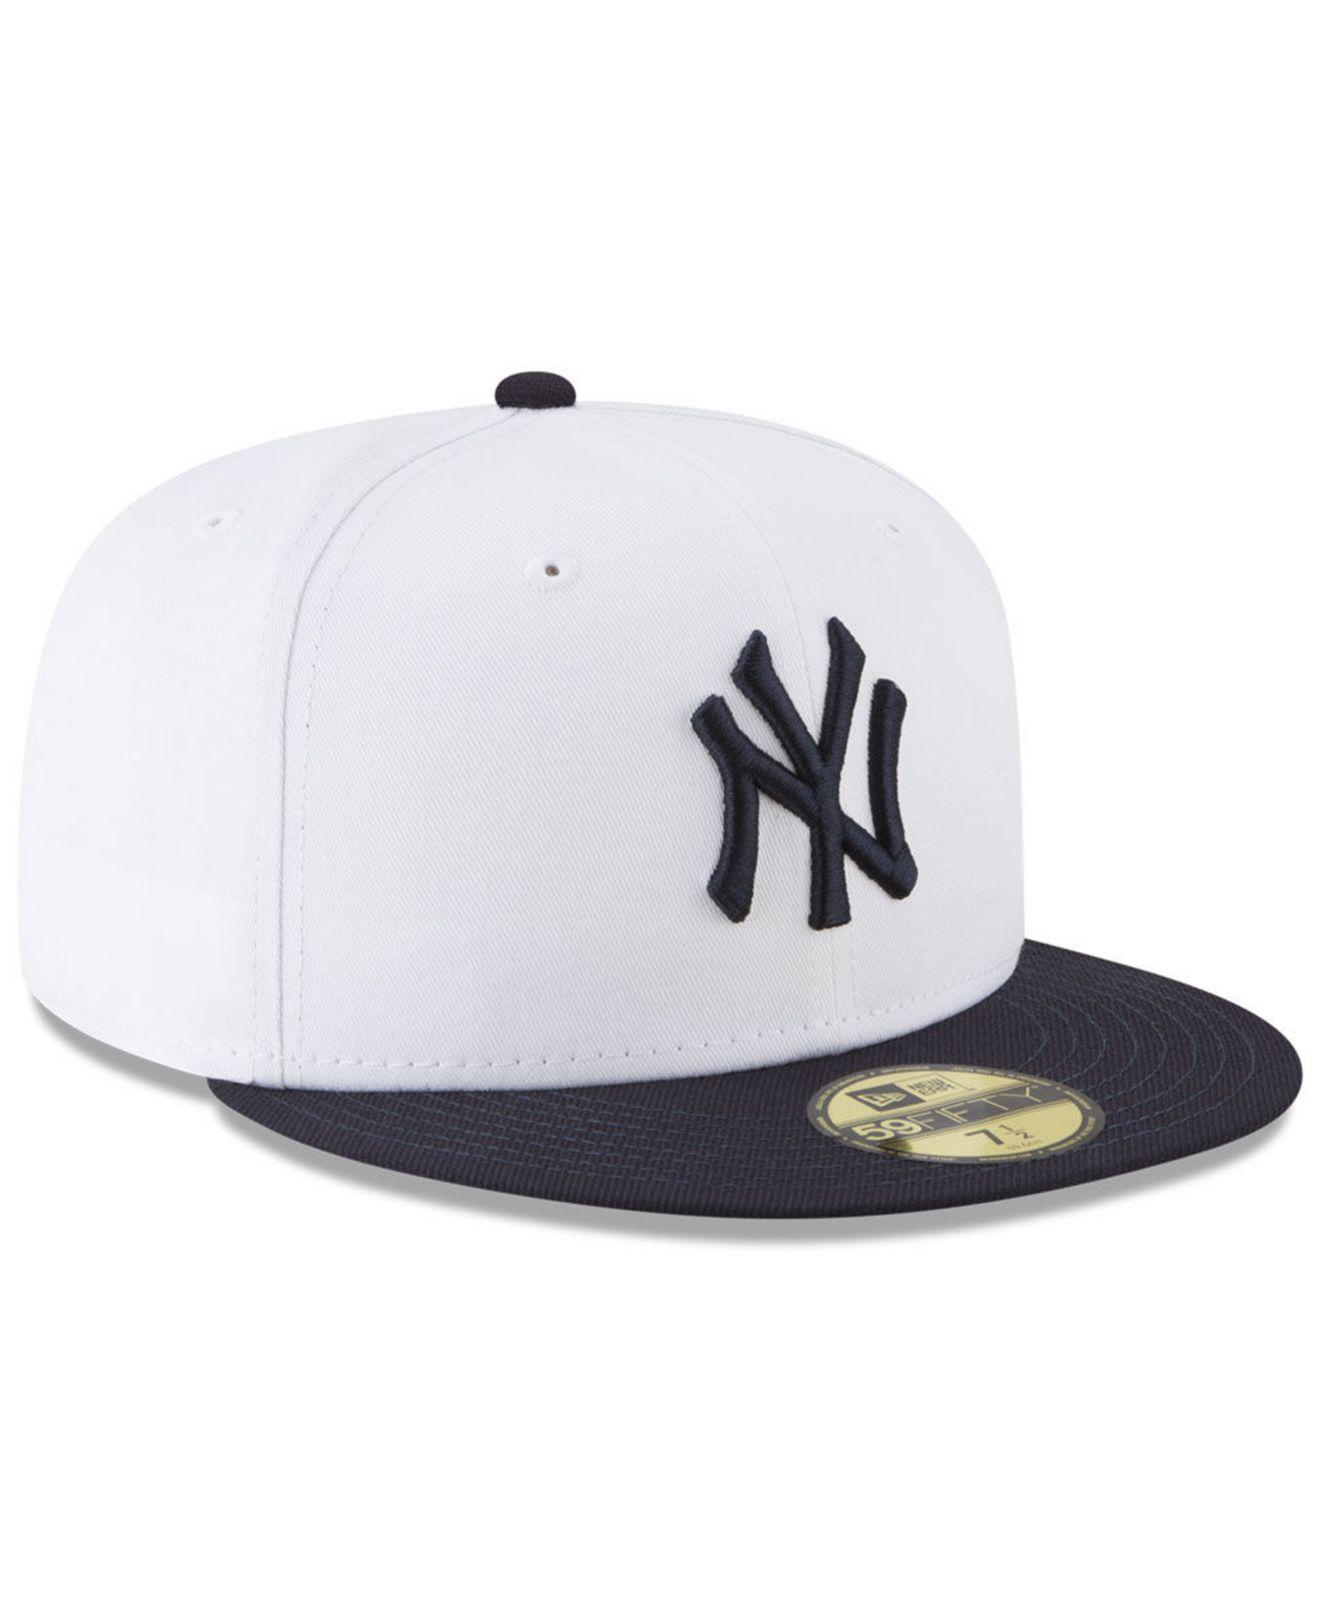 2fbfe04fe13 ... New York Yankees Batting Practice Wool Flip 59fifty Fitted Cap for Men  -. View fullscreen